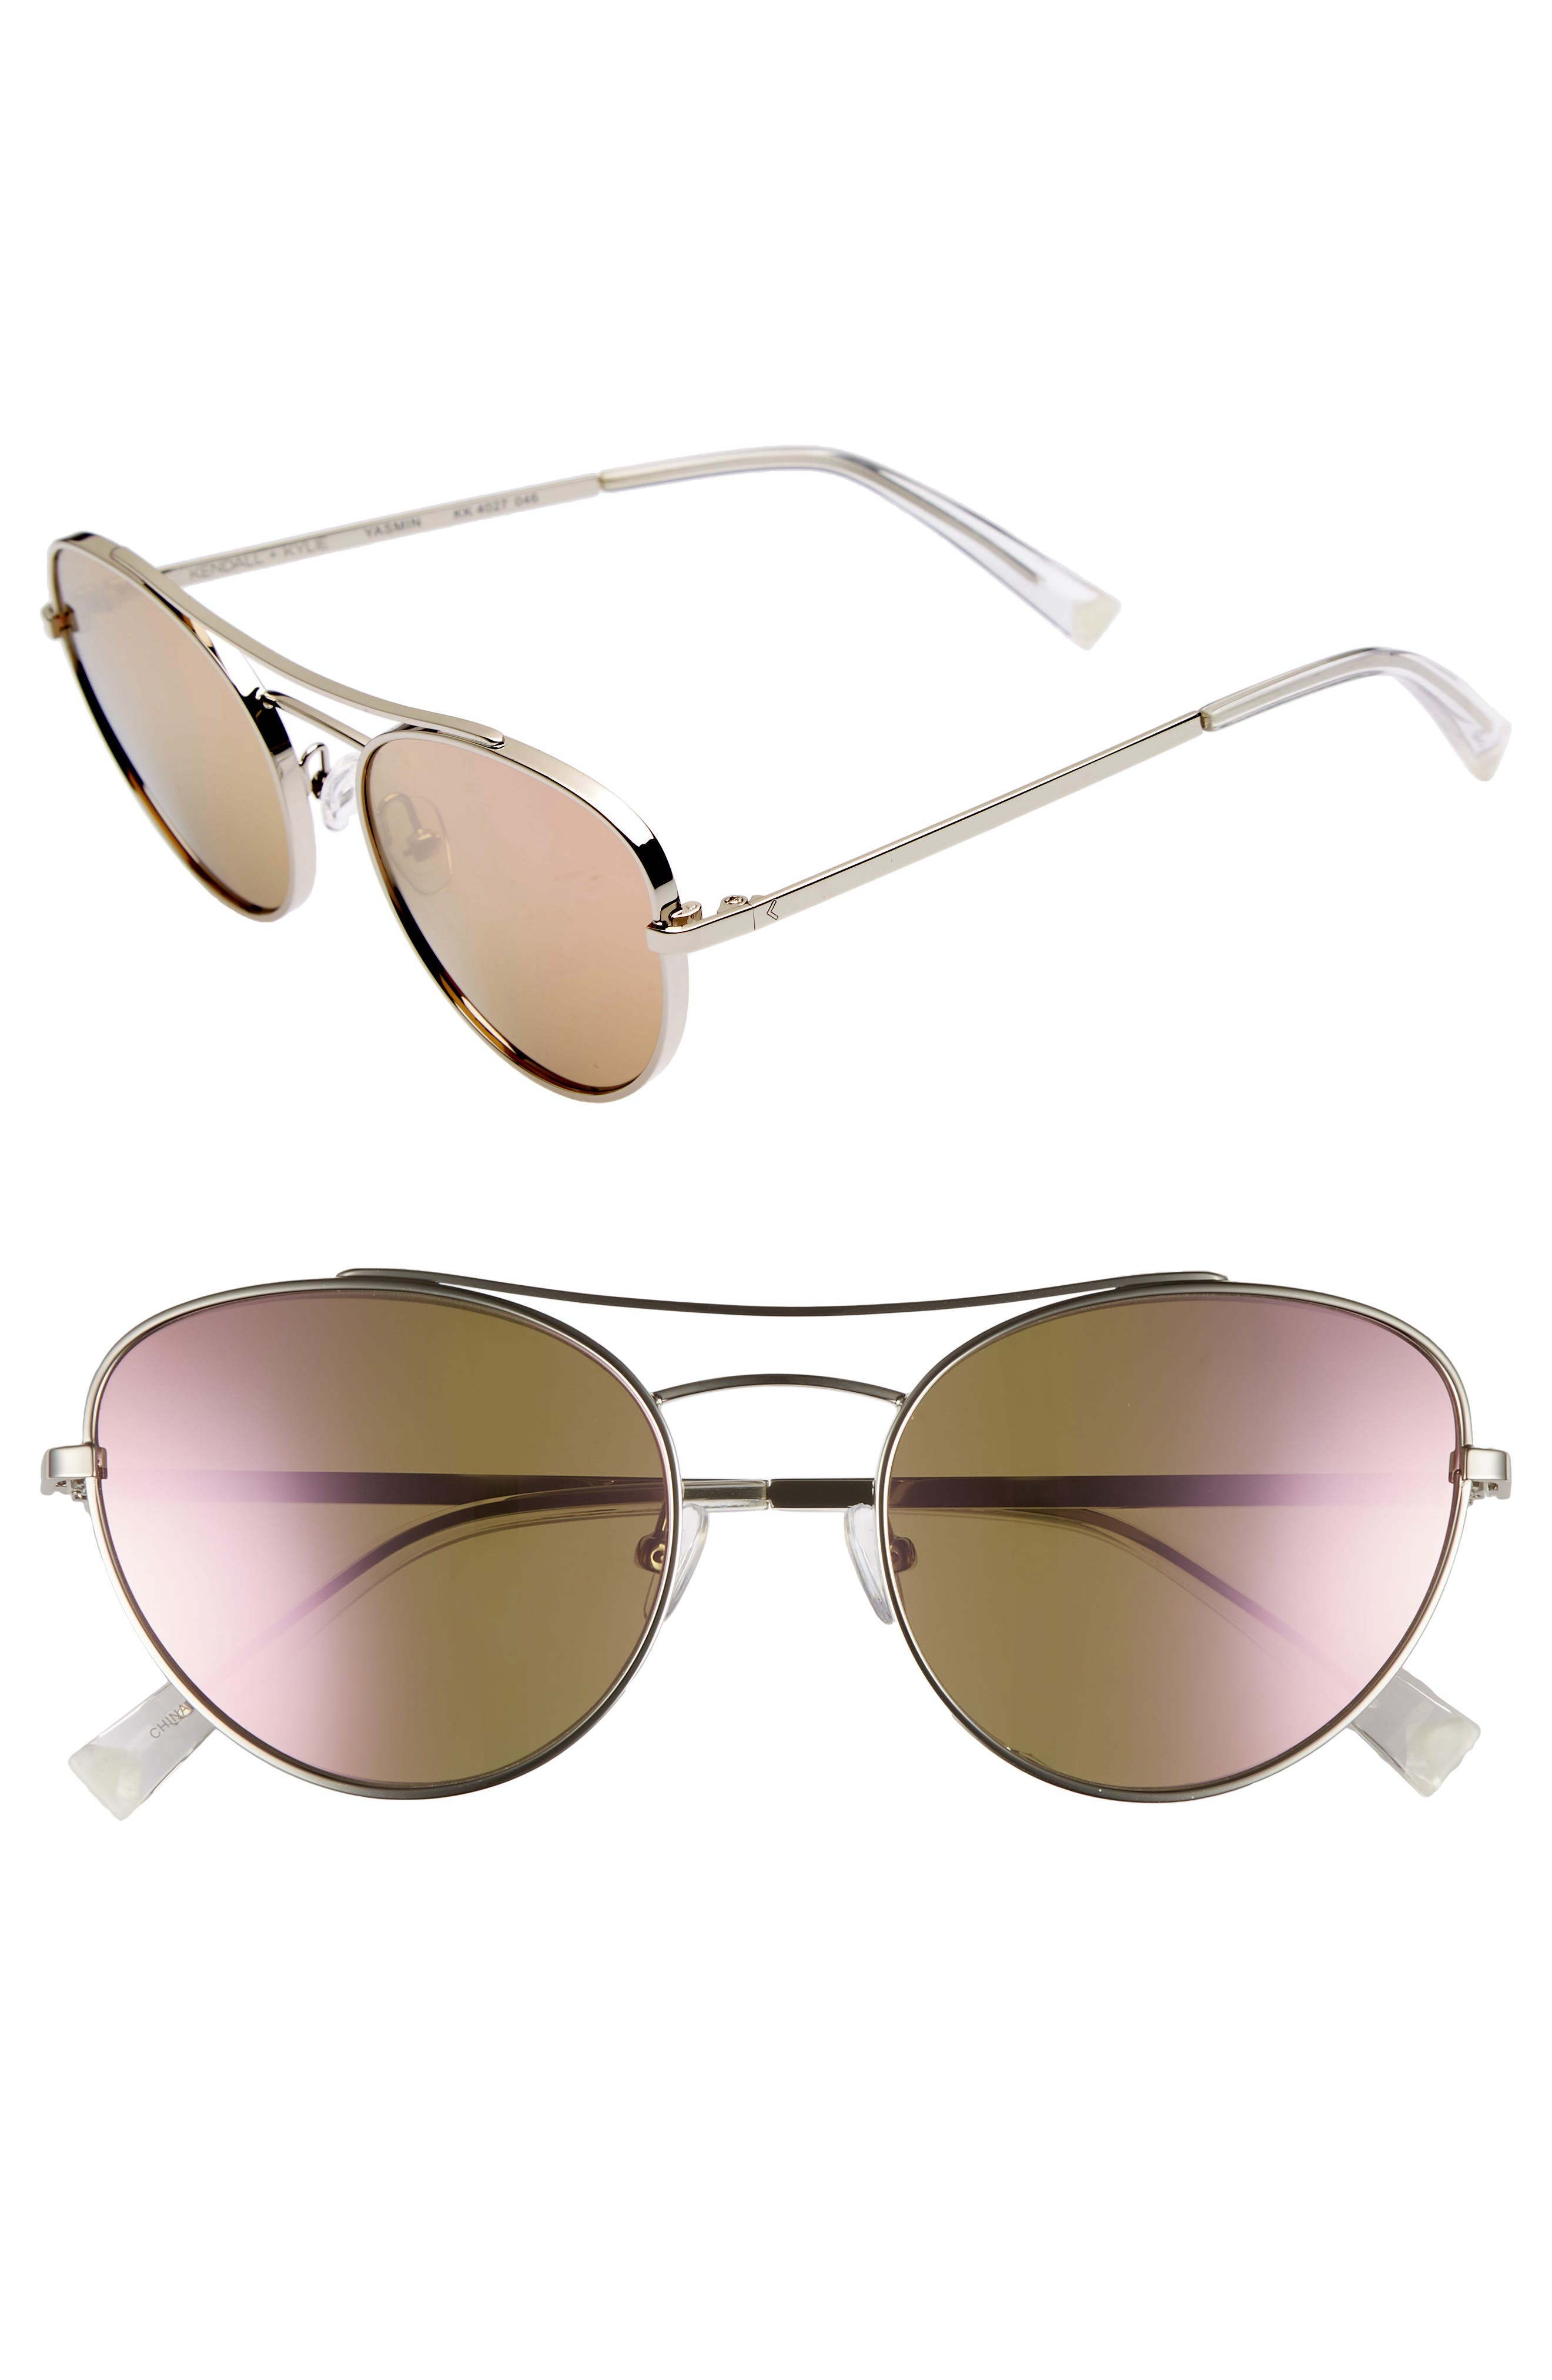 Yasmin 55mm Aviator Sunglasses,                             Main thumbnail 1, color,                             Silver/ Rose Gold Mirror